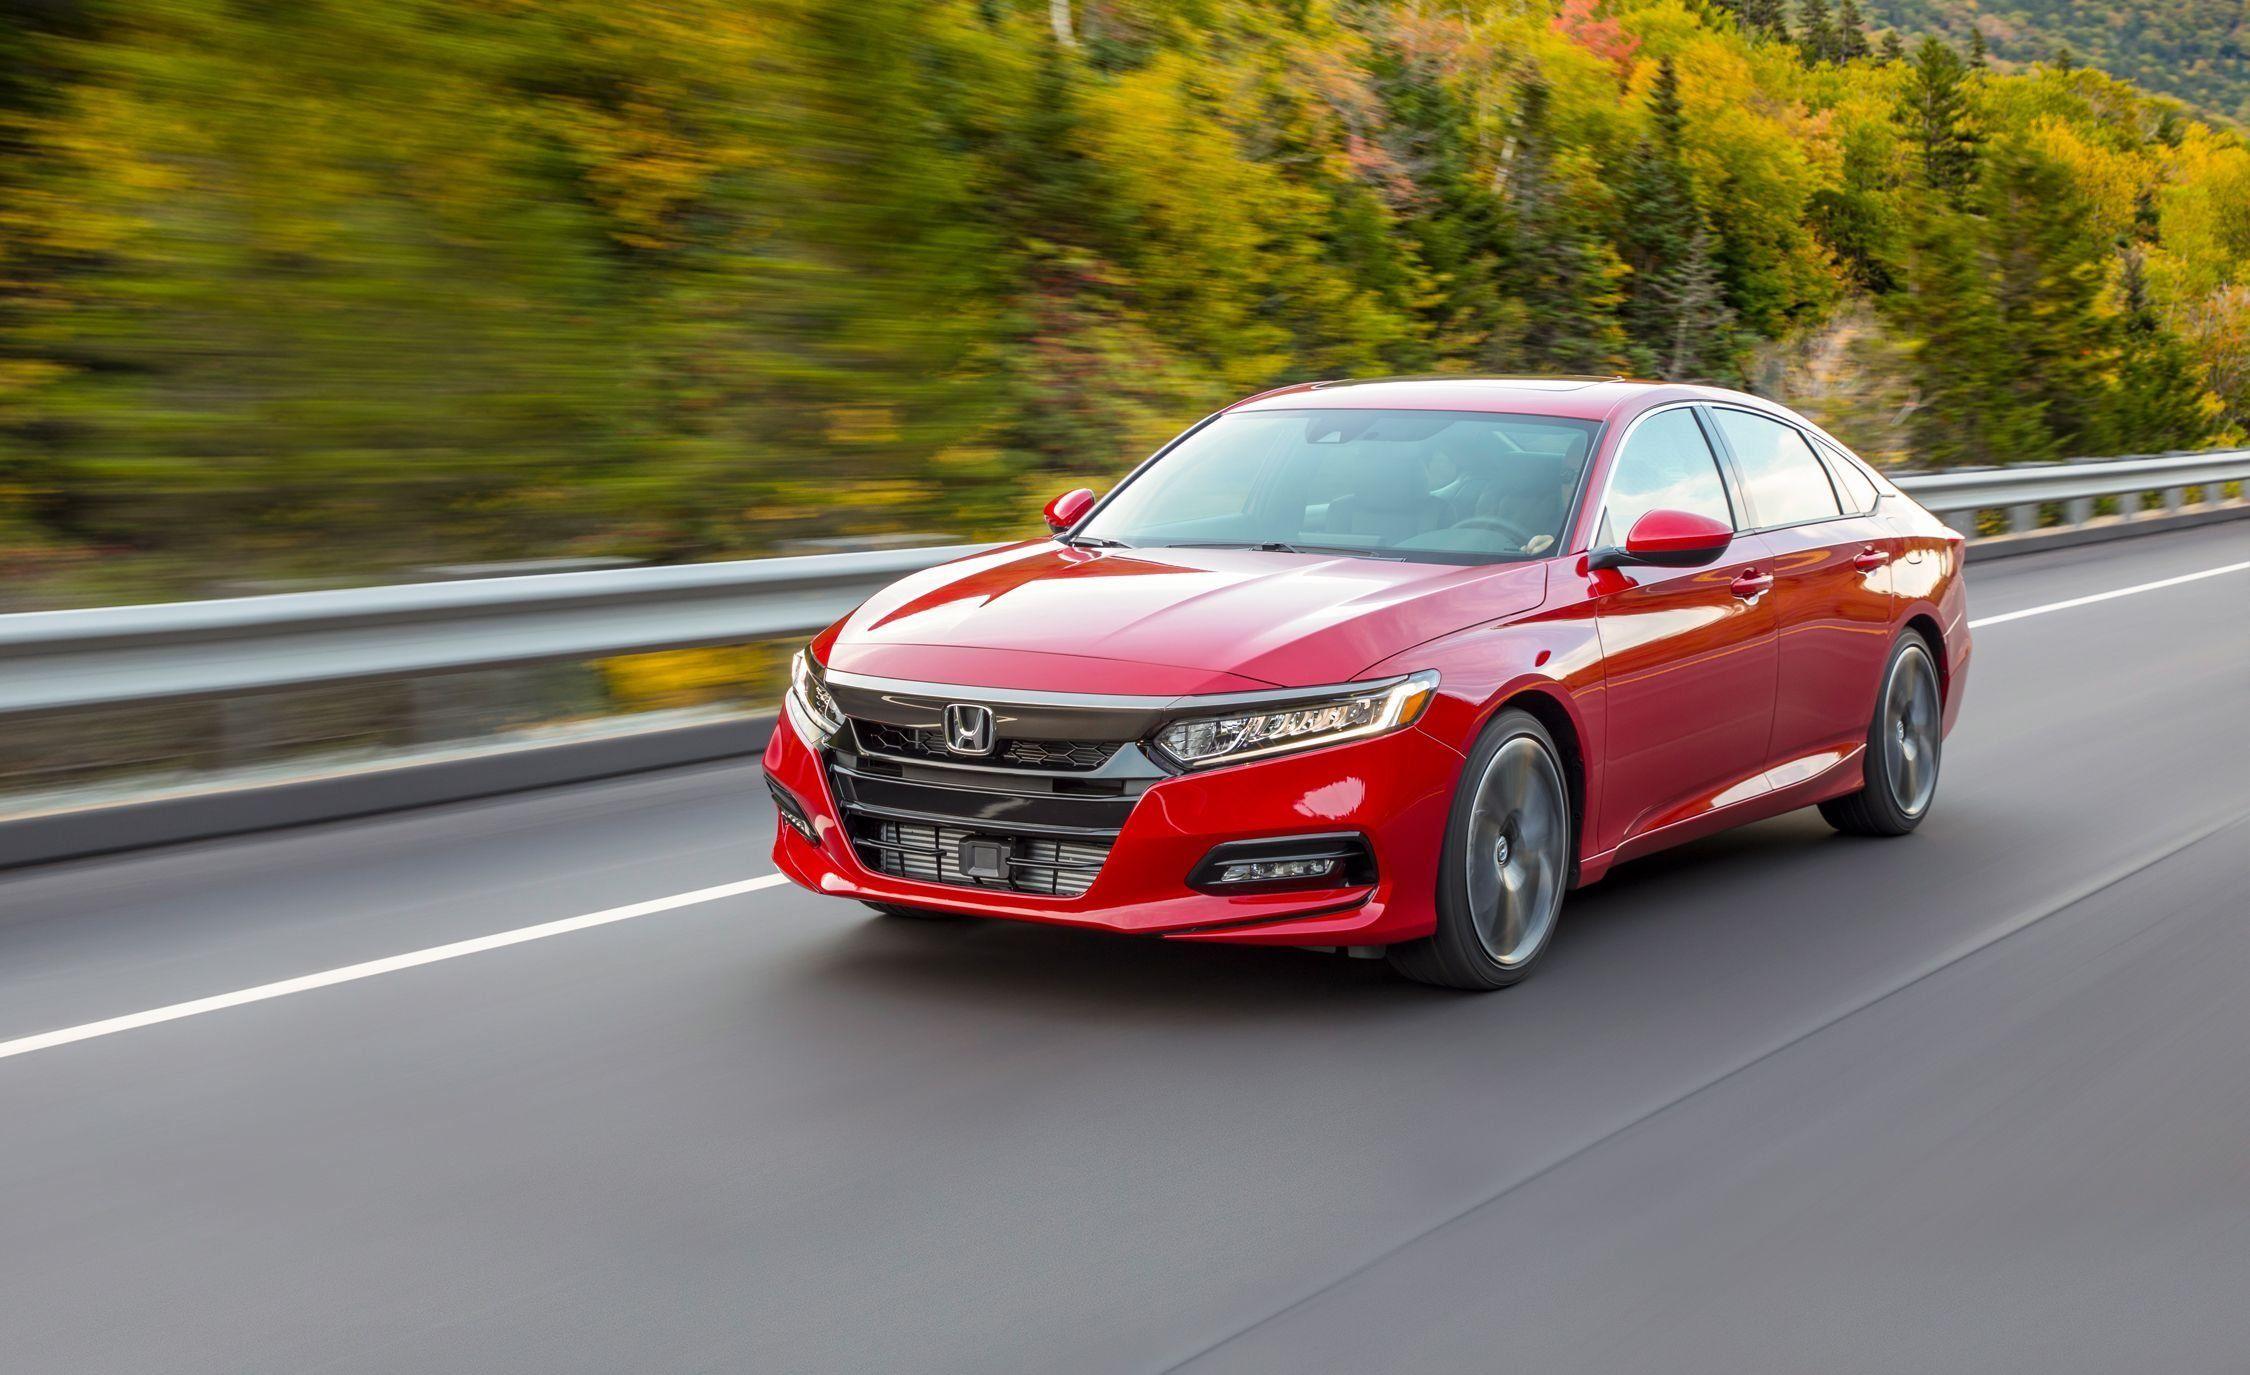 2021 Honda Accord Coupe Sedan Performance and New Engine